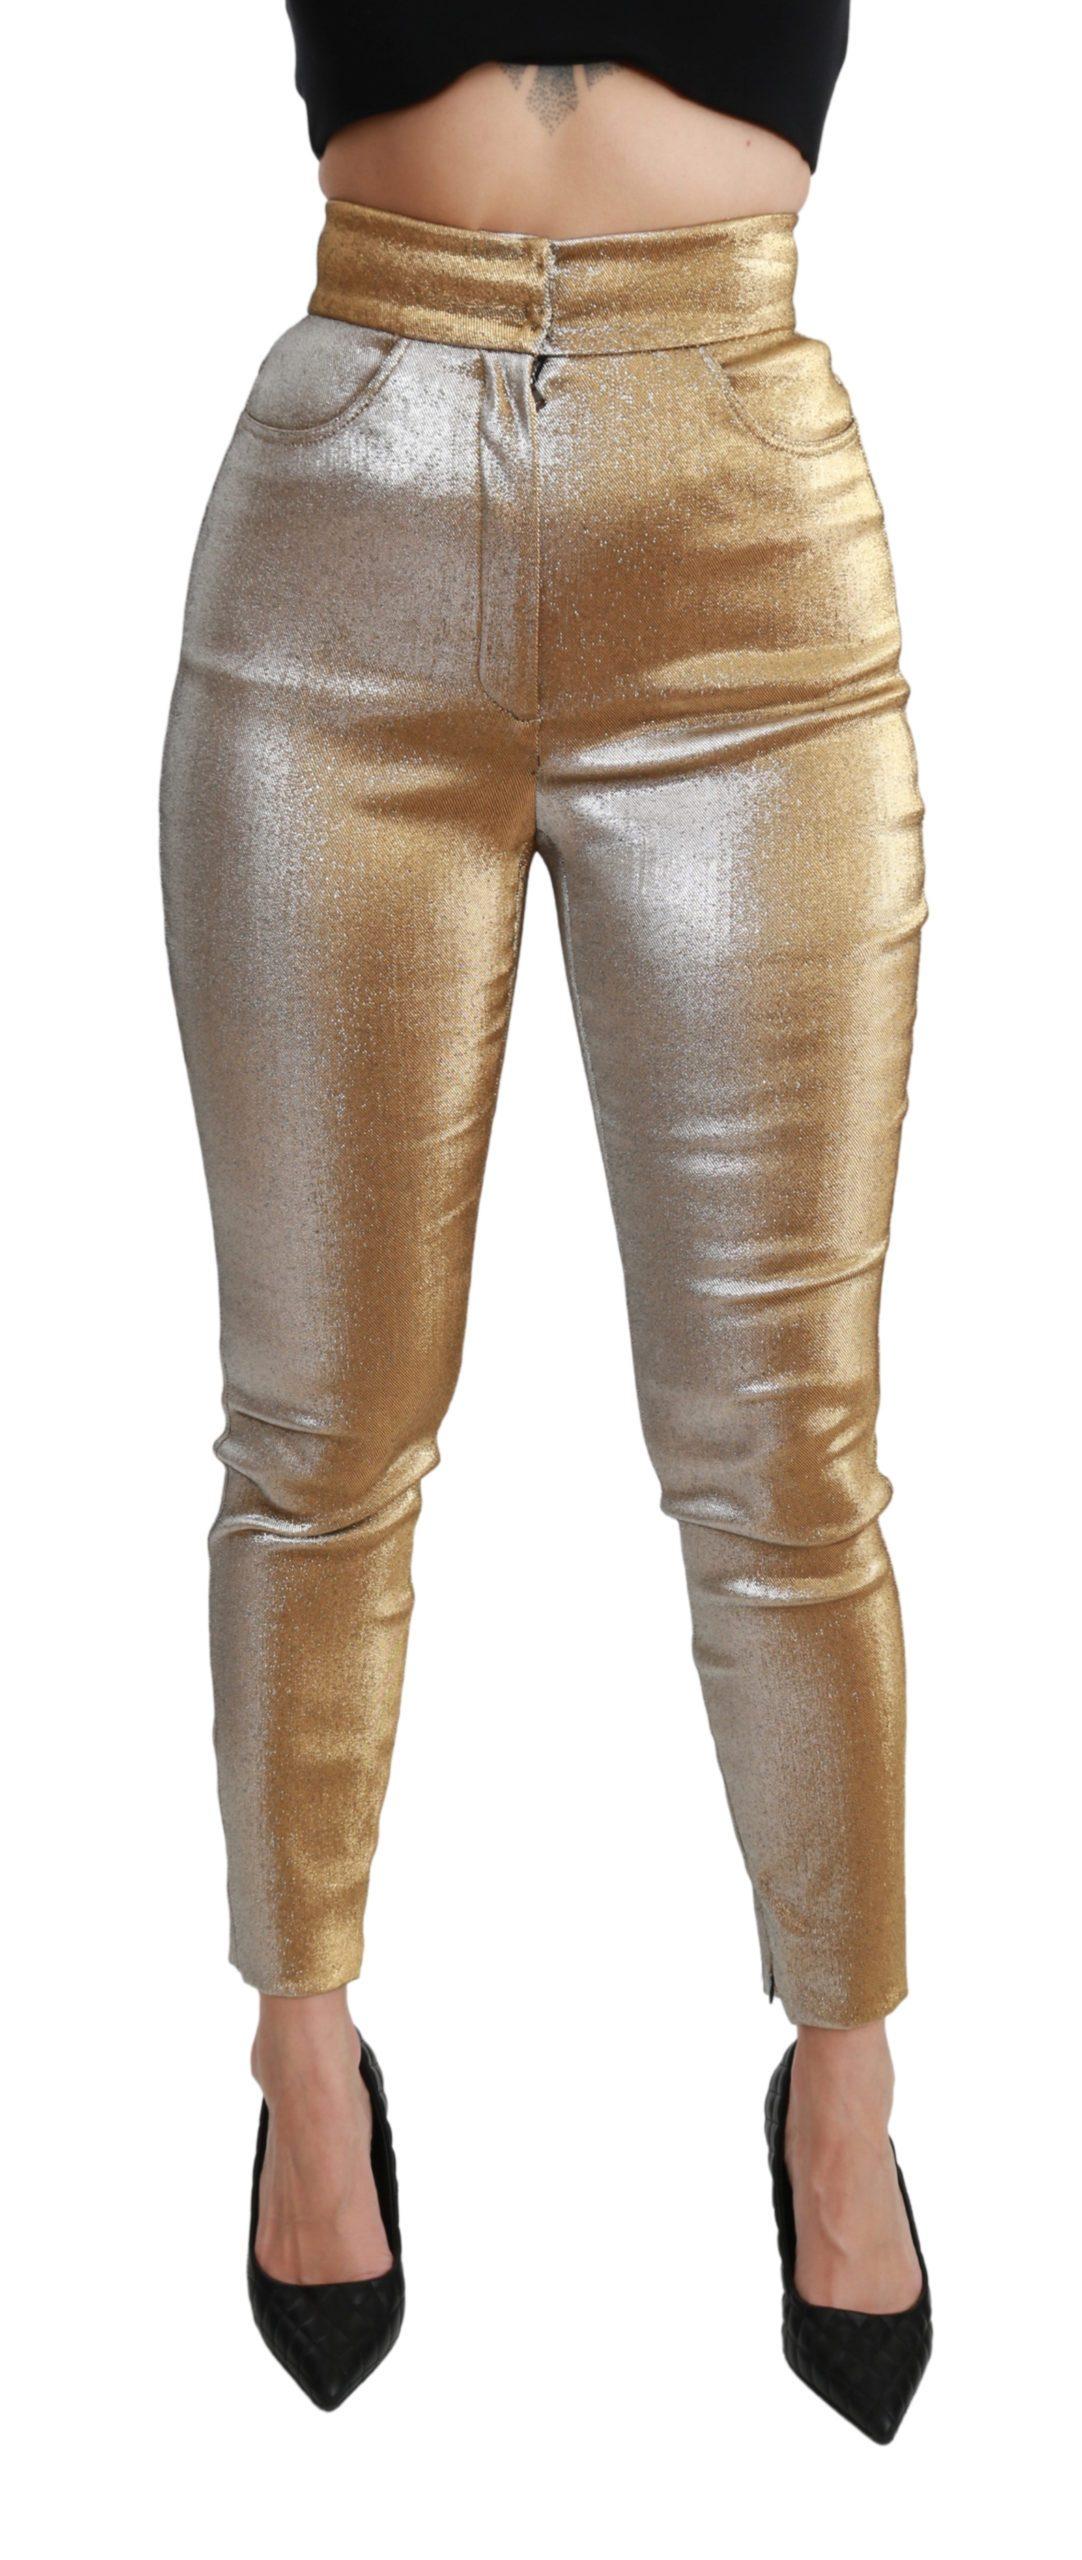 Dolce & Gabbana Women's Glittered Skinny High Waist Trouser Gold PAN70944 - IT40 S